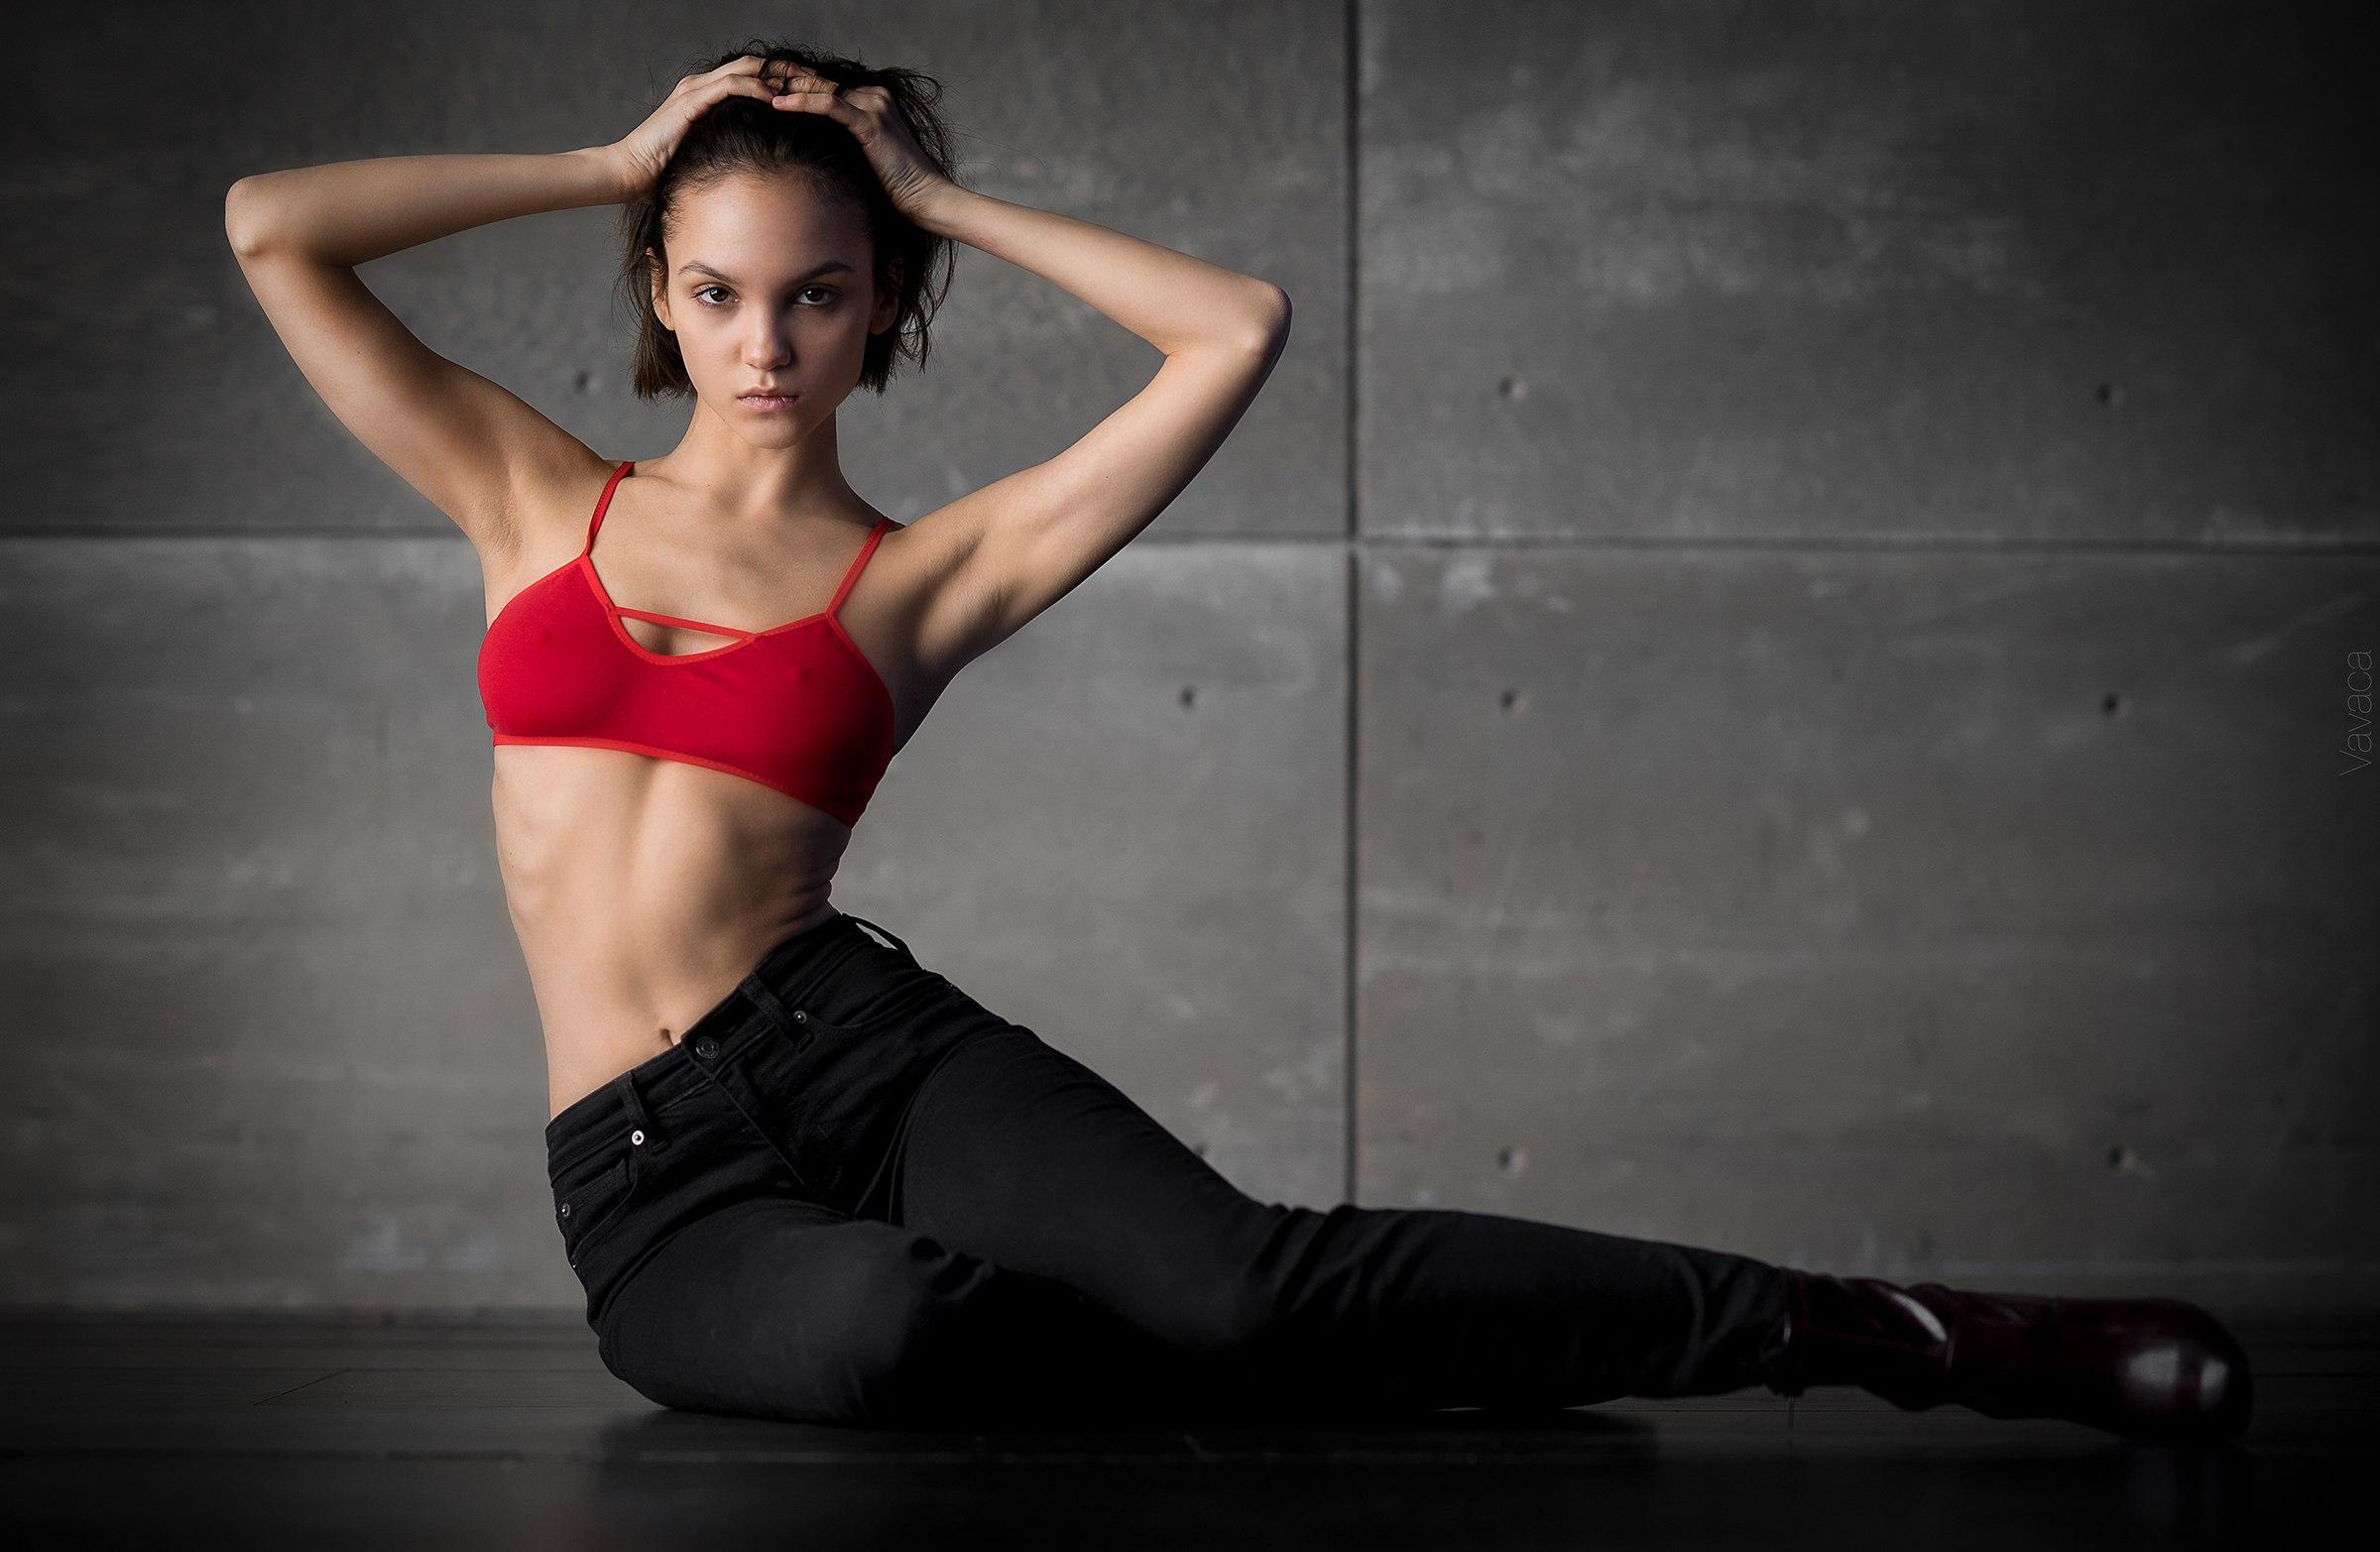 Video Maria Demina nudes (24 images), Hot